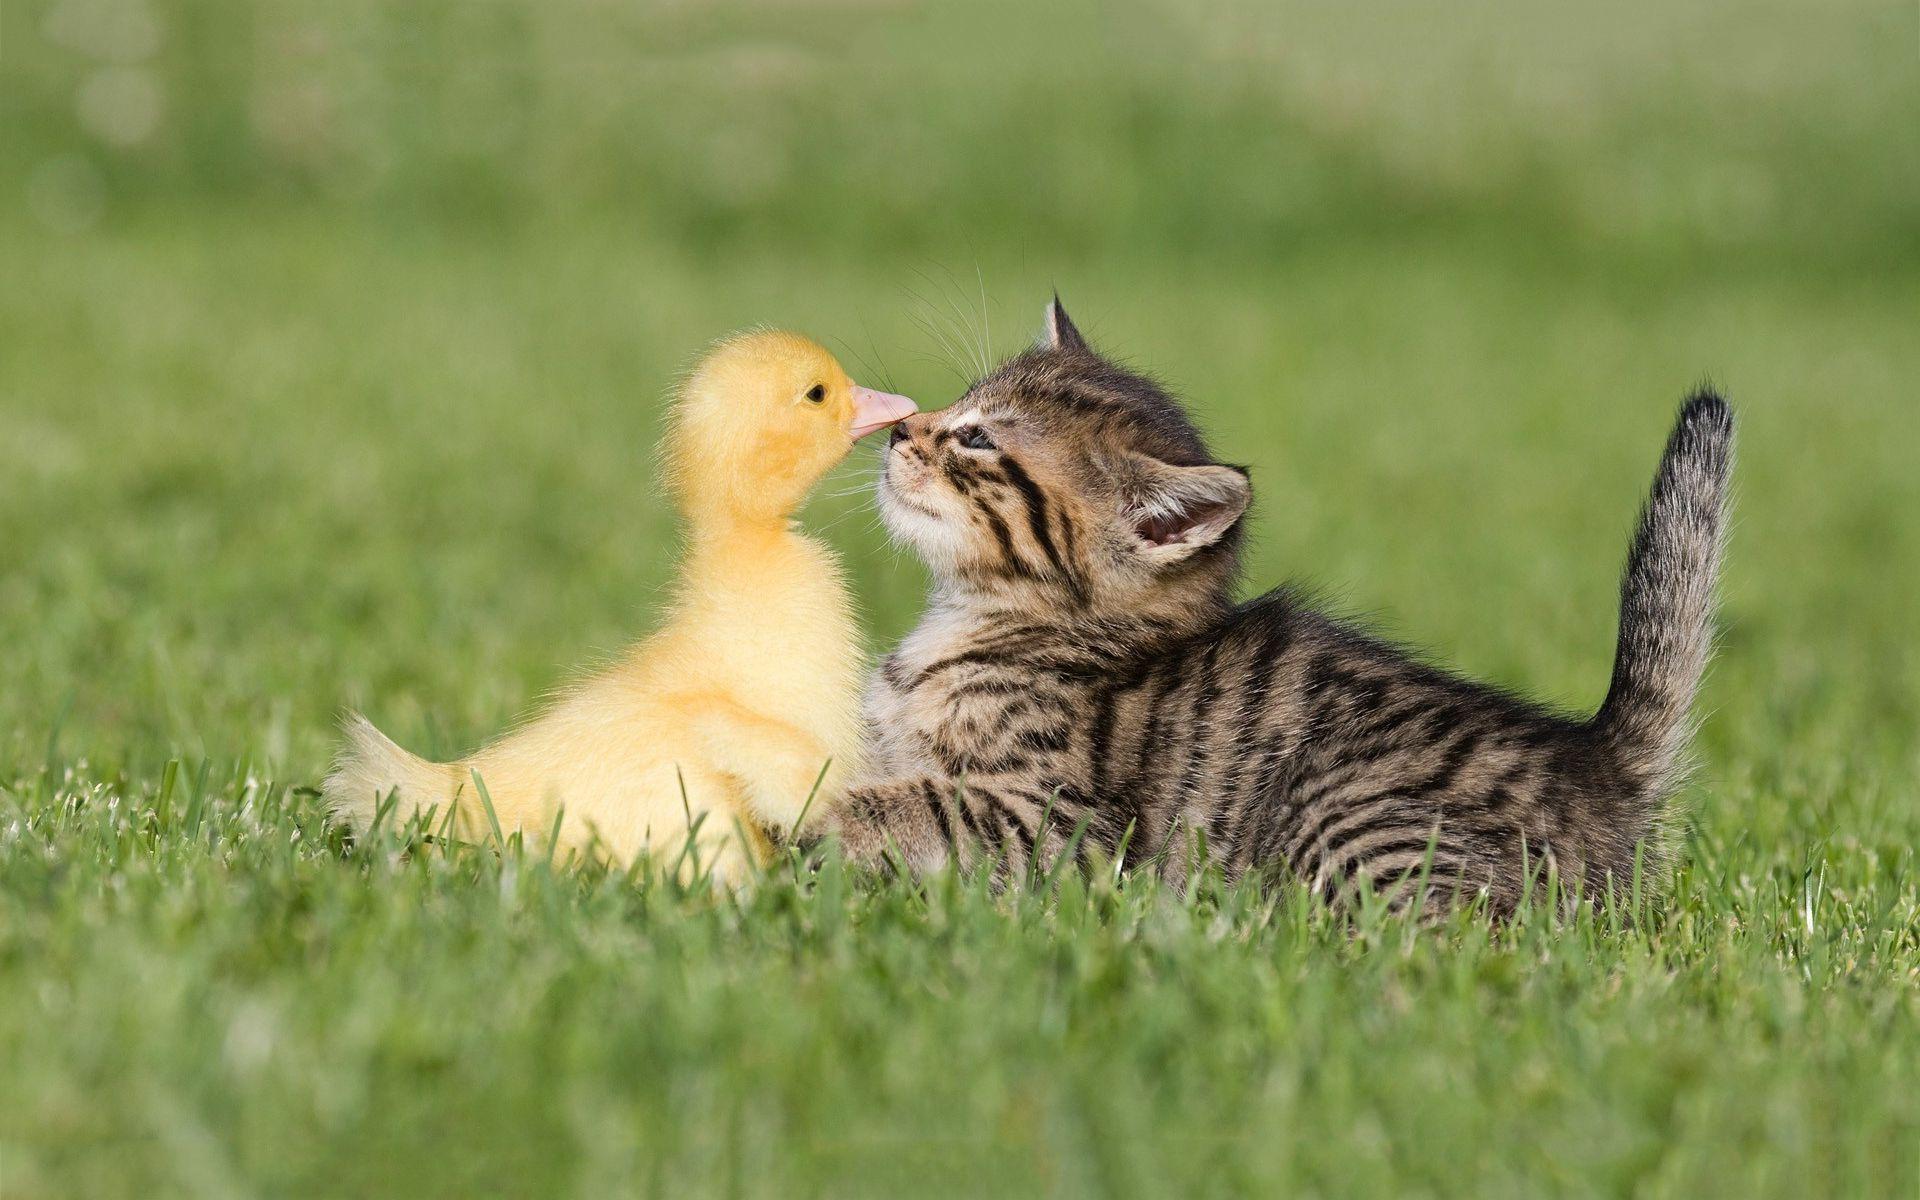 Kitten And Duckling Pictures Wallpaper   Wallpaper Download